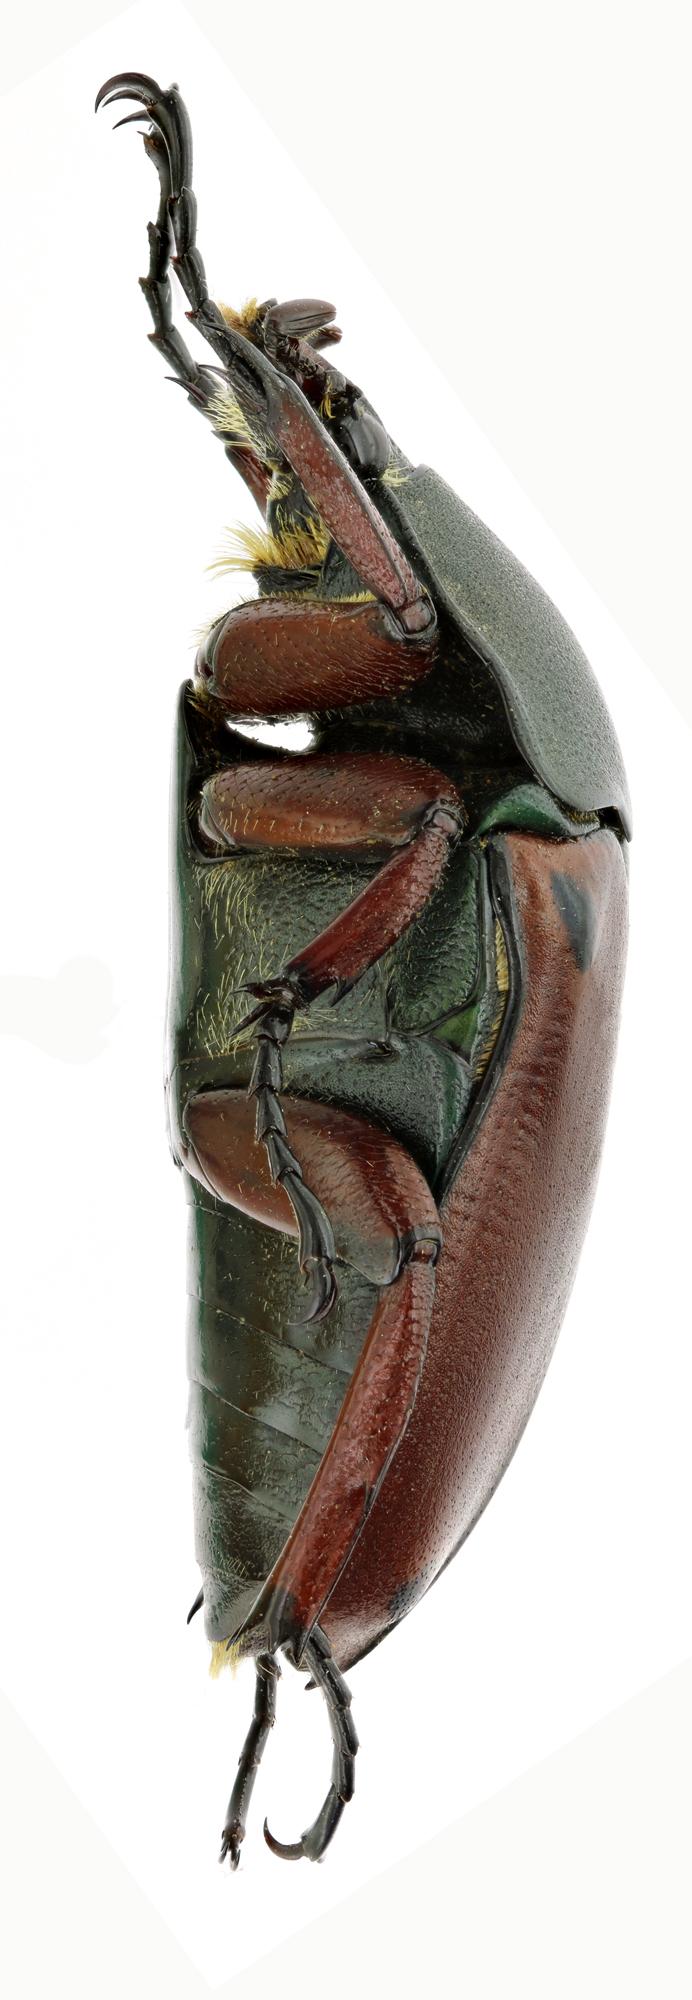 Eudicella smithi lequeuxi 17912zs29.jpg